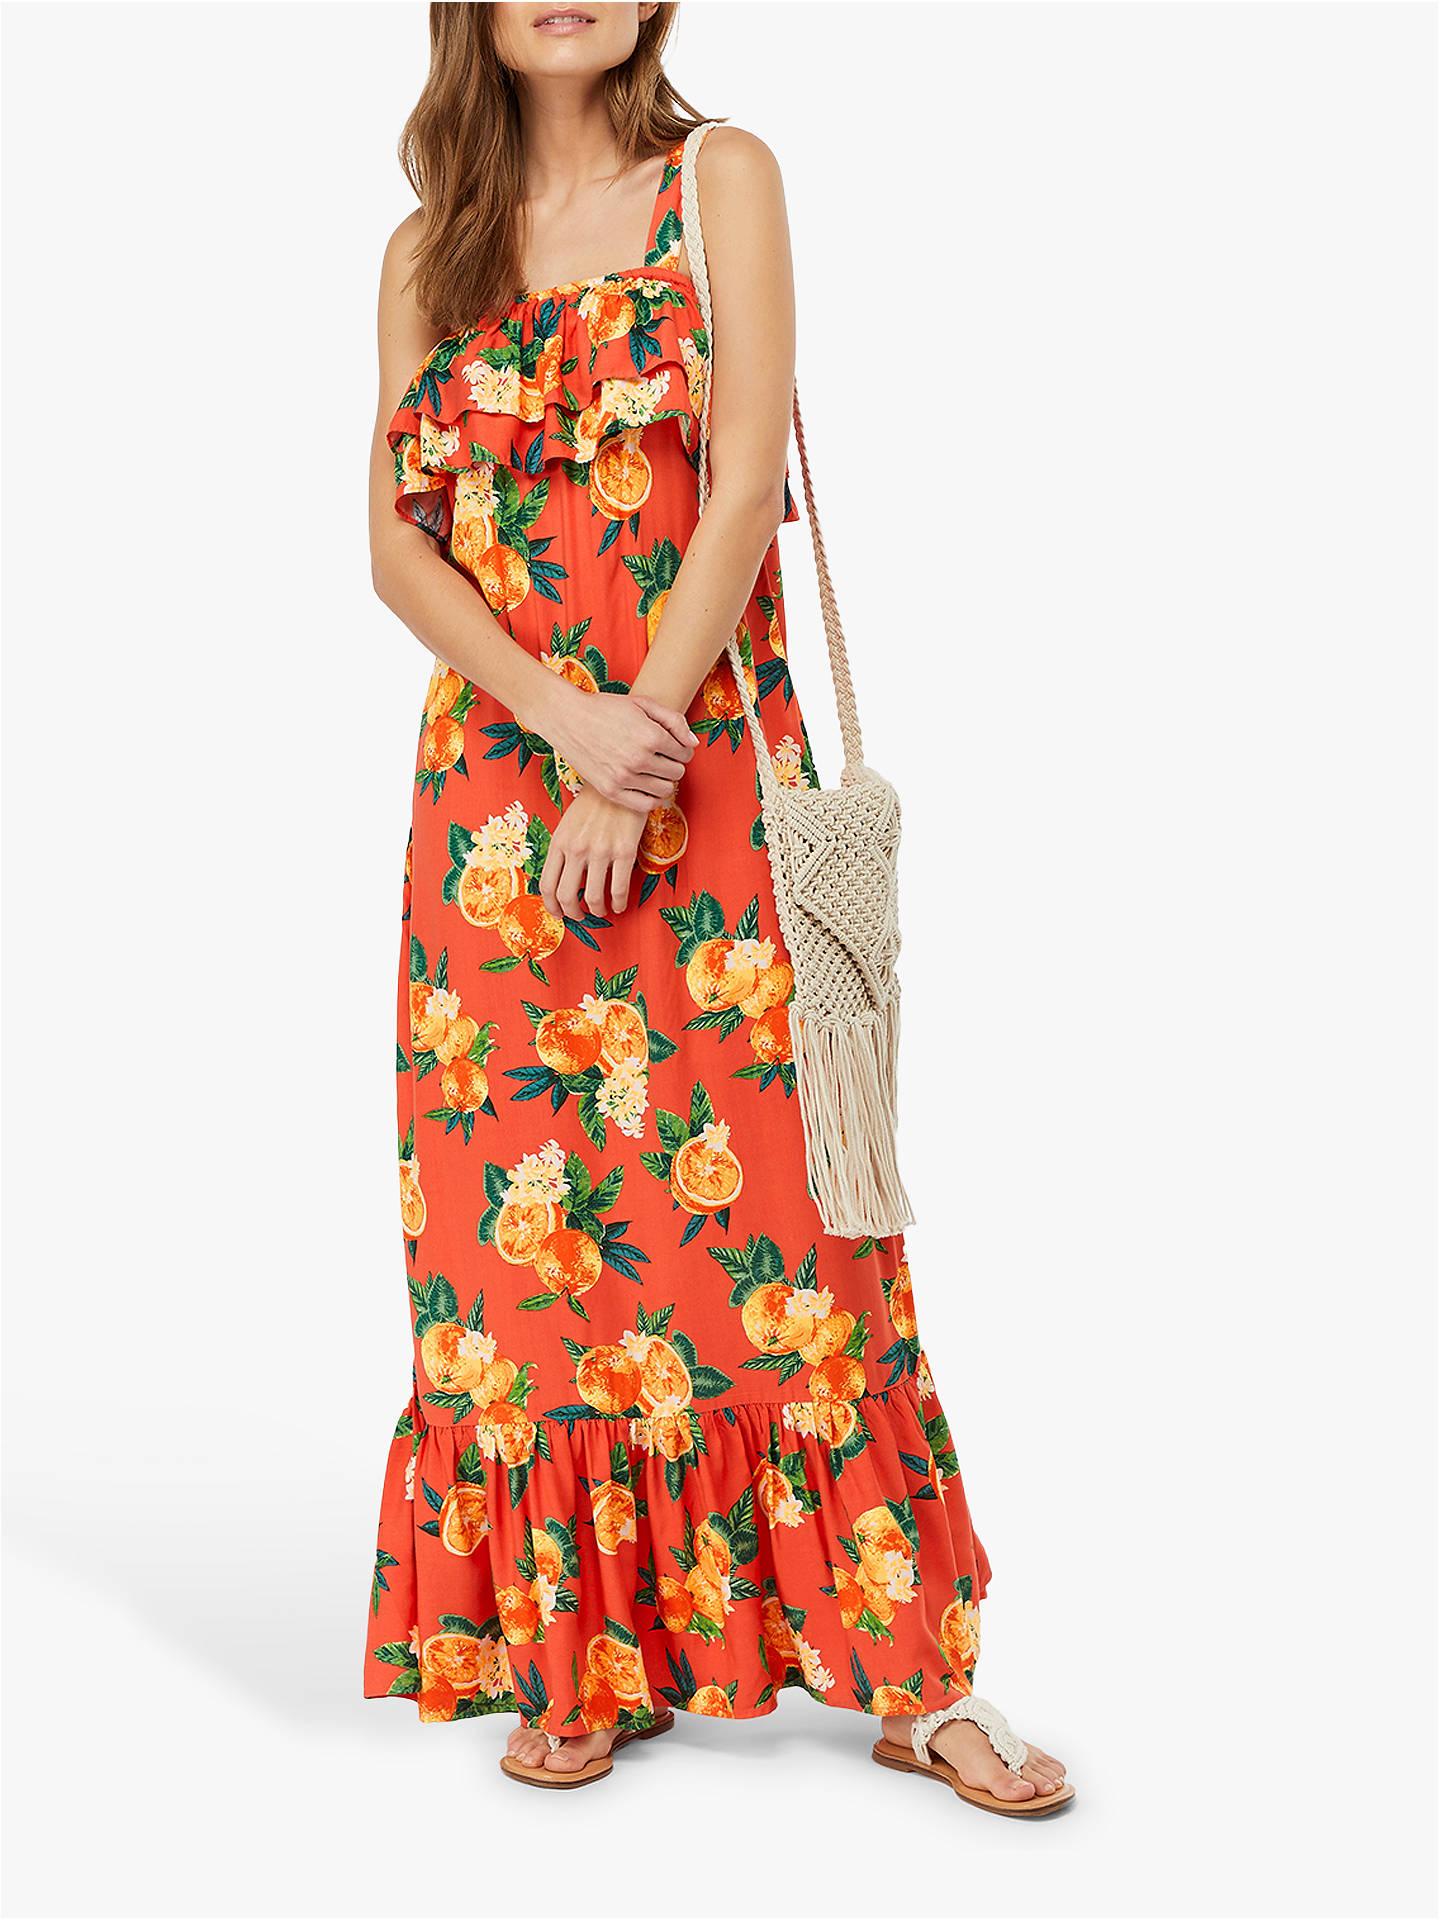 09a50a4d668 Buy Monsoon Laranja Orange Print Maxi Dress, Orange, S Online at  johnlewis.com ...